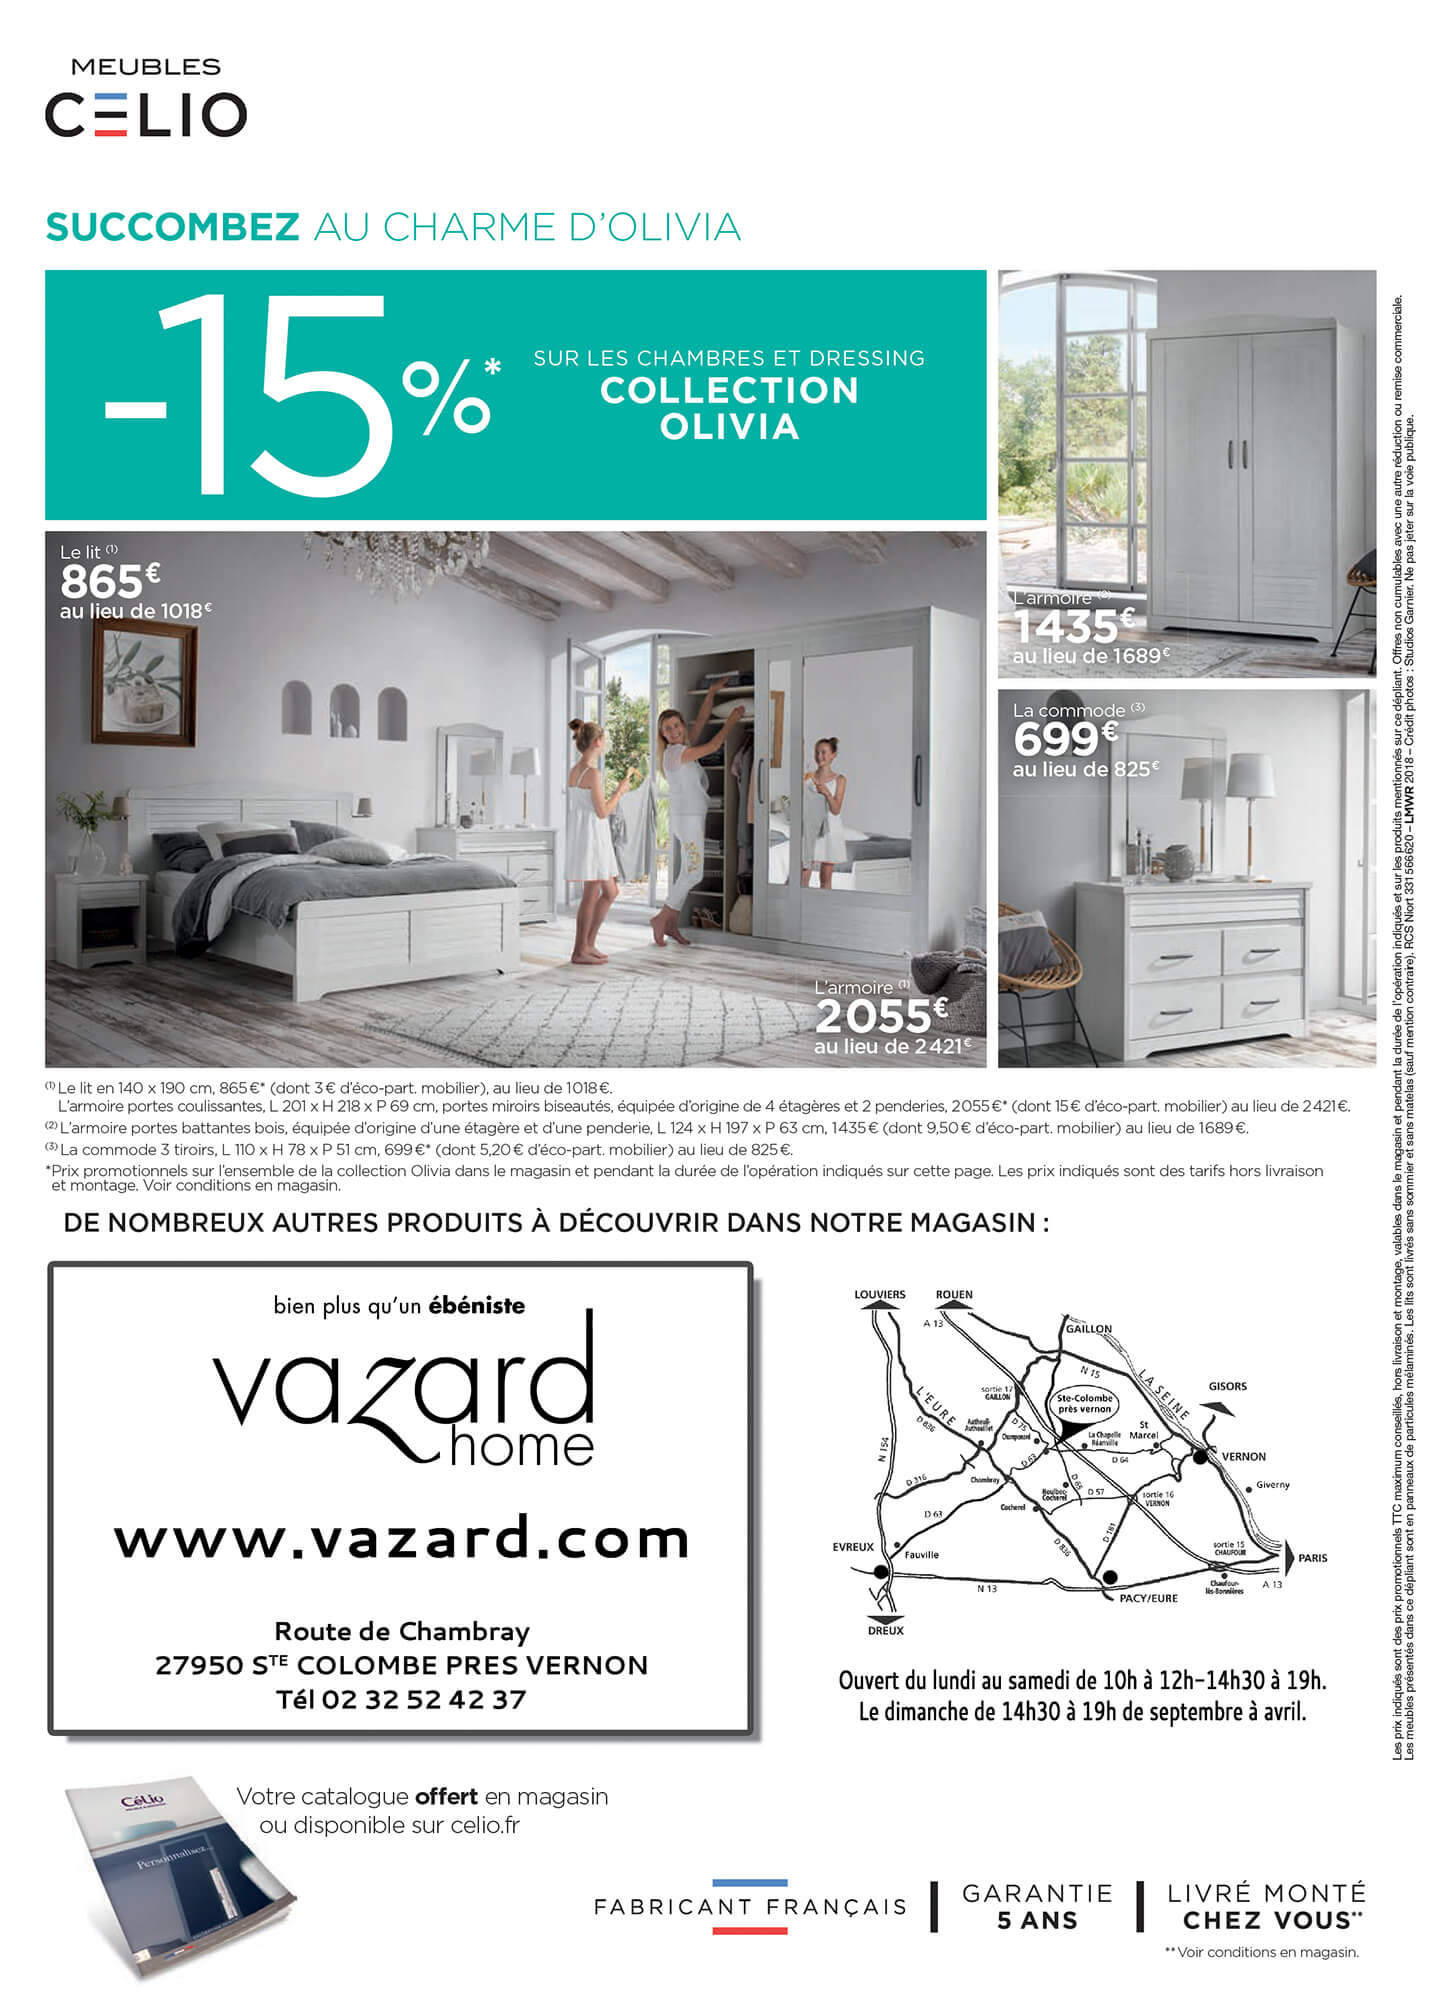 meuble-celio-promotion-mars-2019-vazard-home-p7